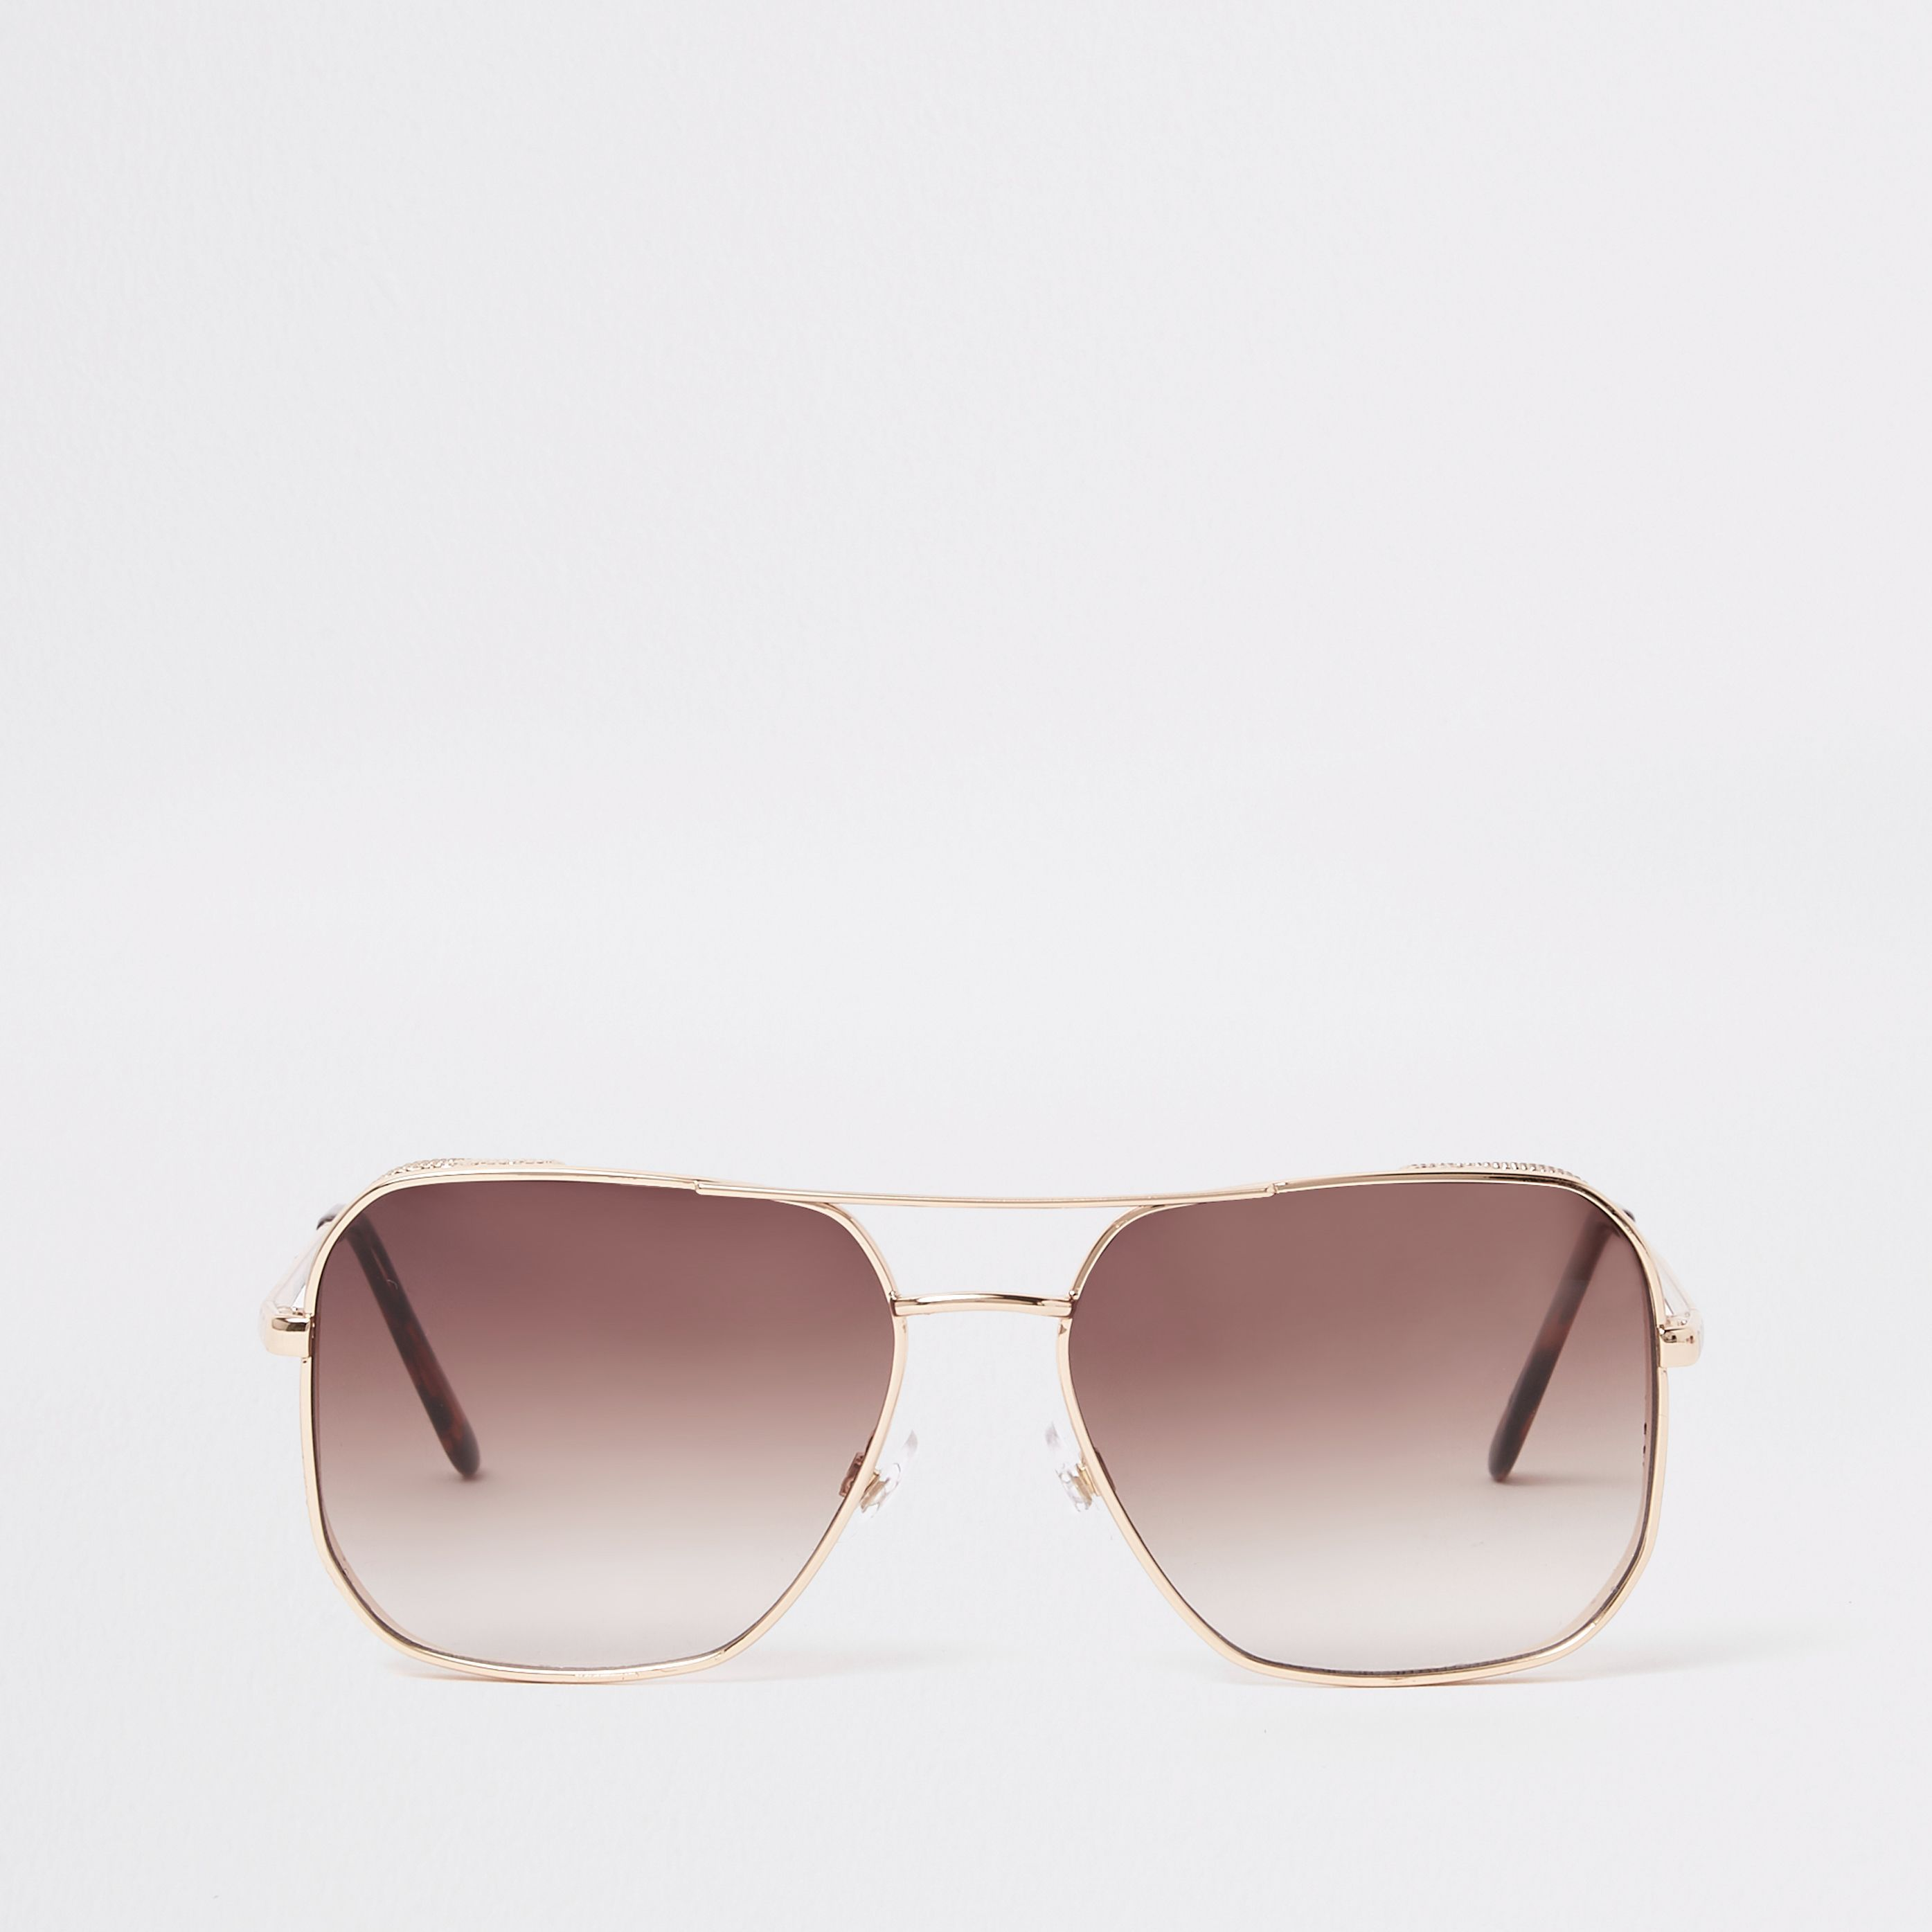 b41a13654f5 Mens Brown gold tone retro aviator sunglasses in 2019